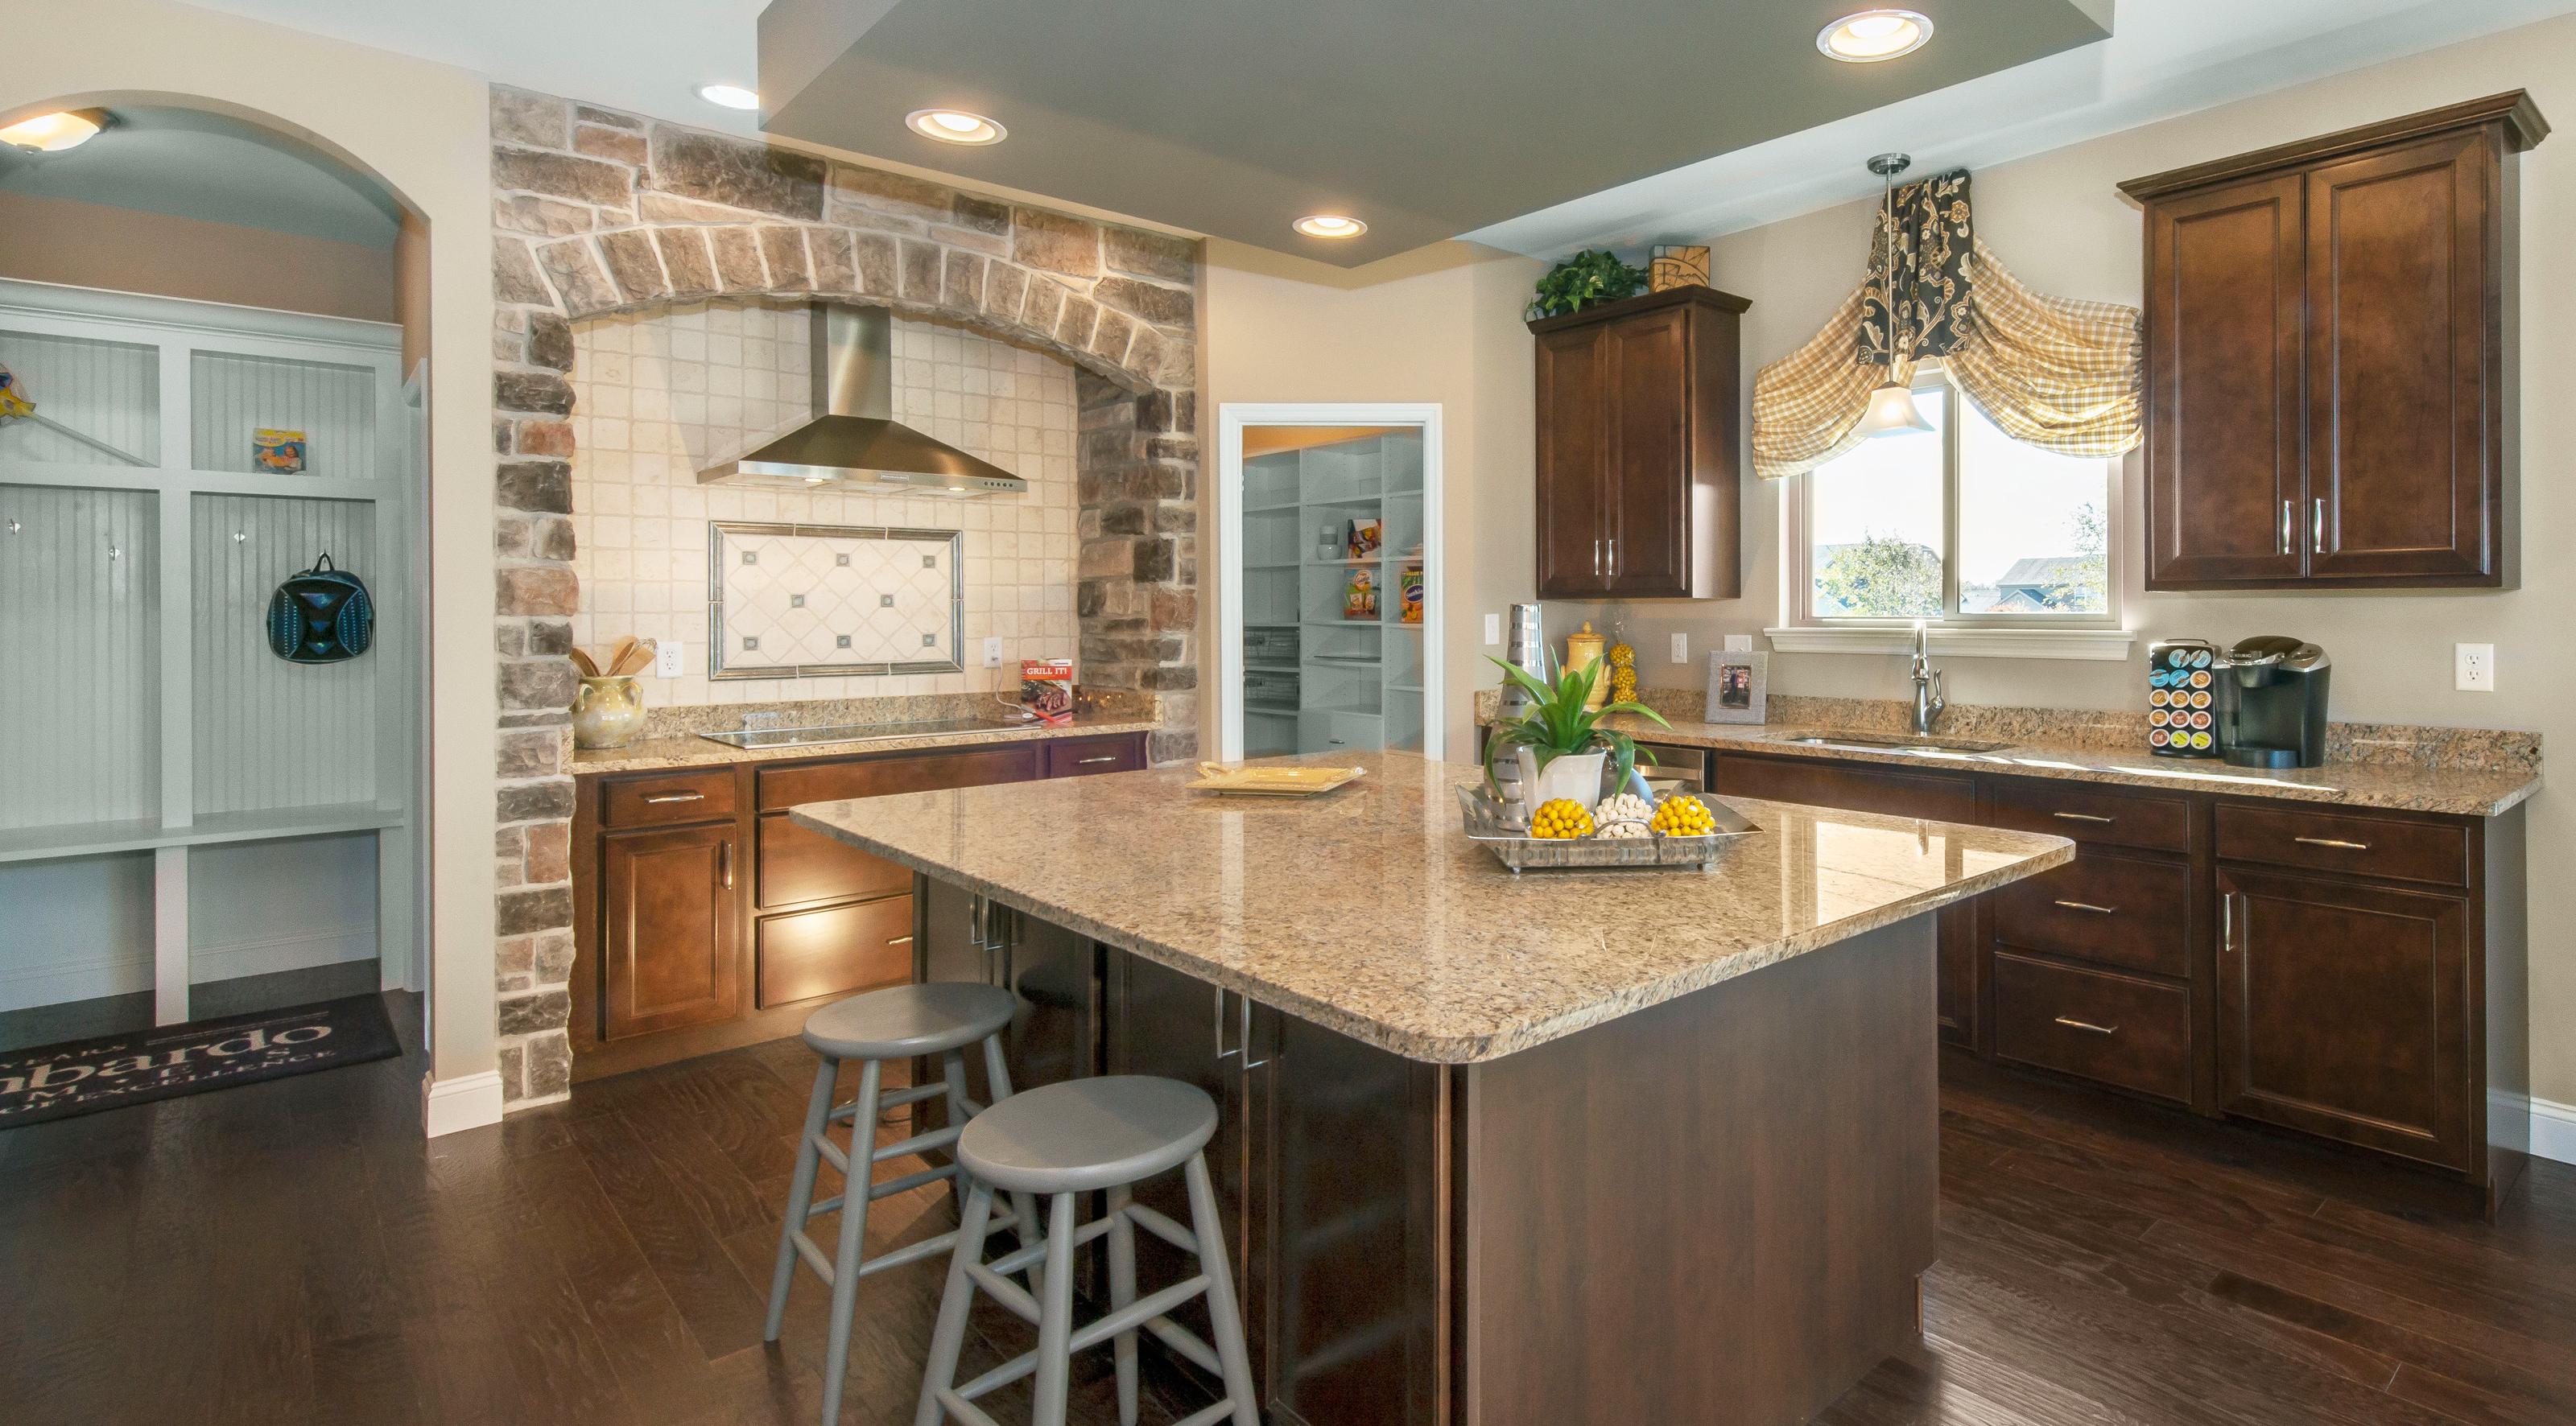 lombard-large-kitchen03